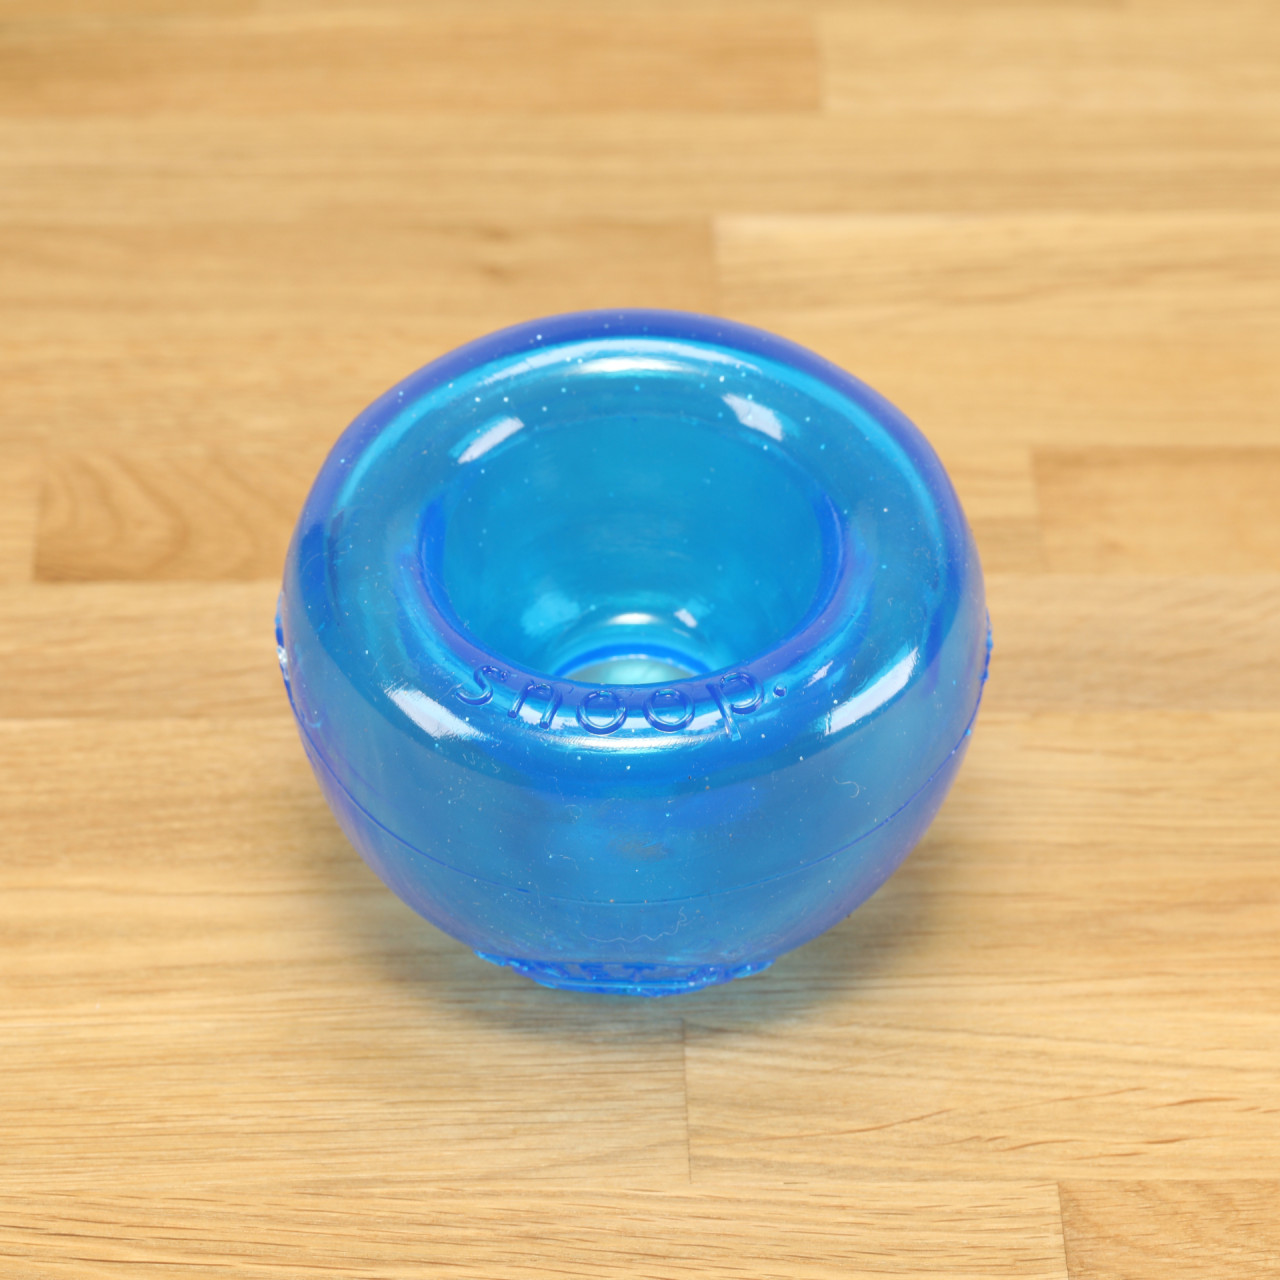 Hundespielzeug Ball Lil' Snoop royal blau